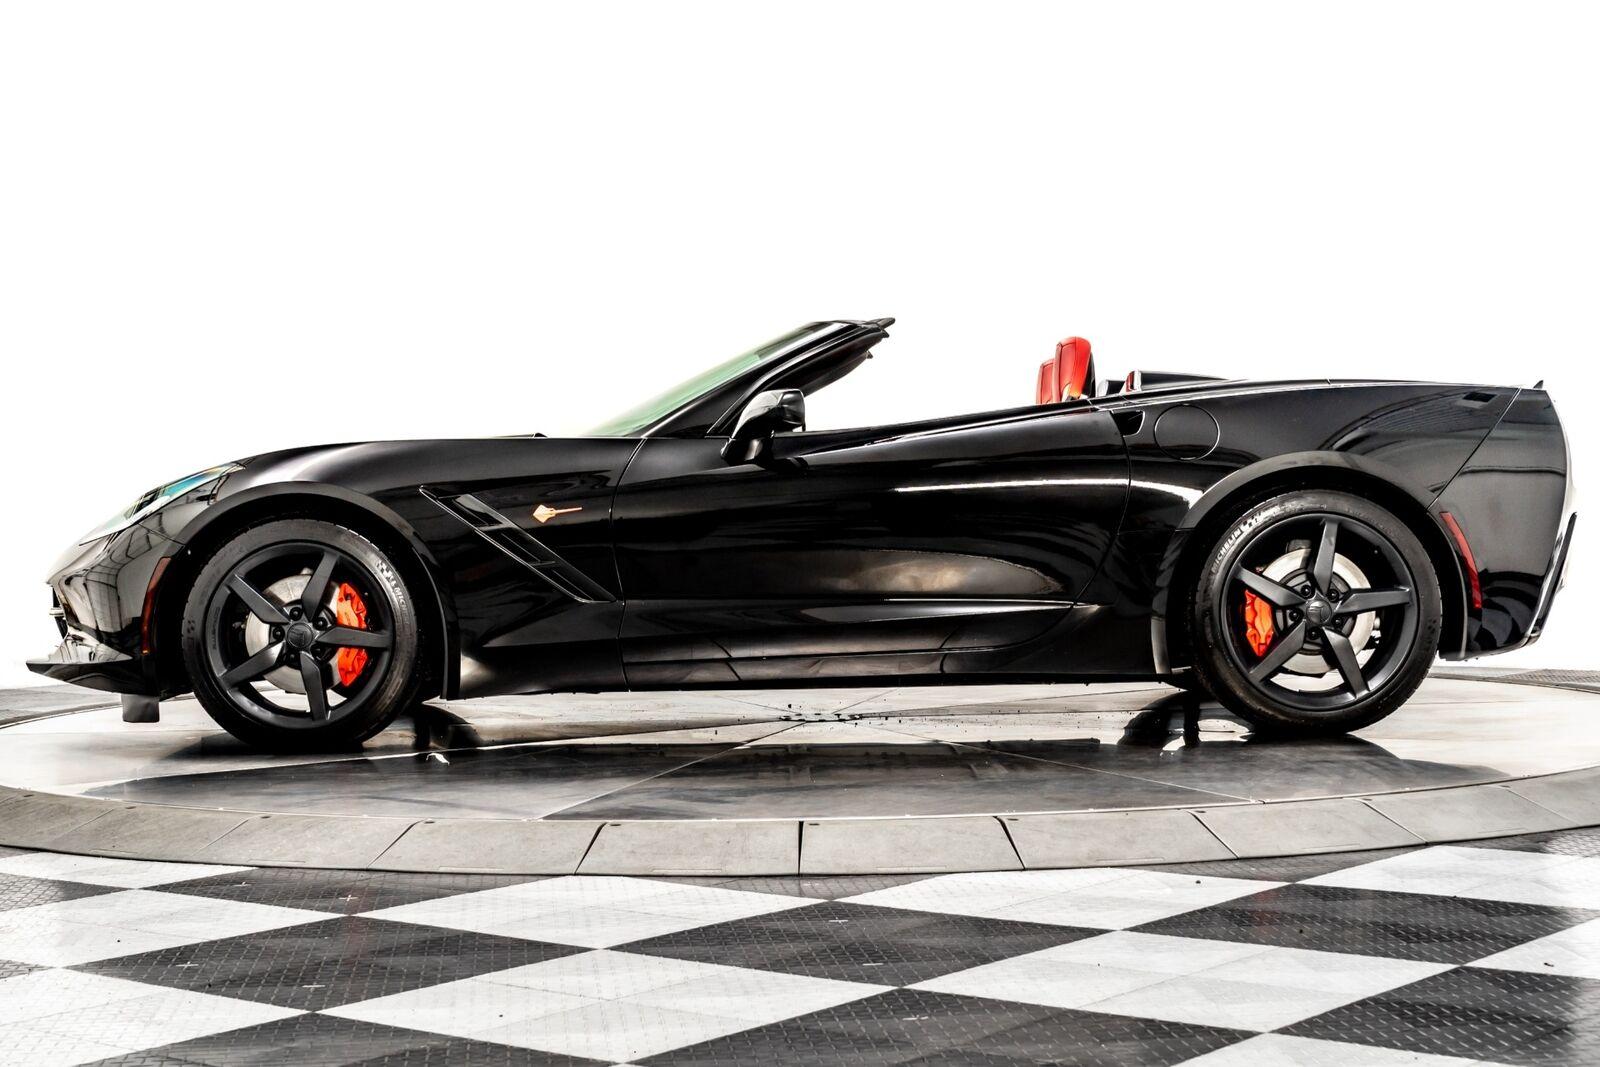 2014 Black Chevrolet Corvette Convertible 2LT   C7 Corvette Photo 5